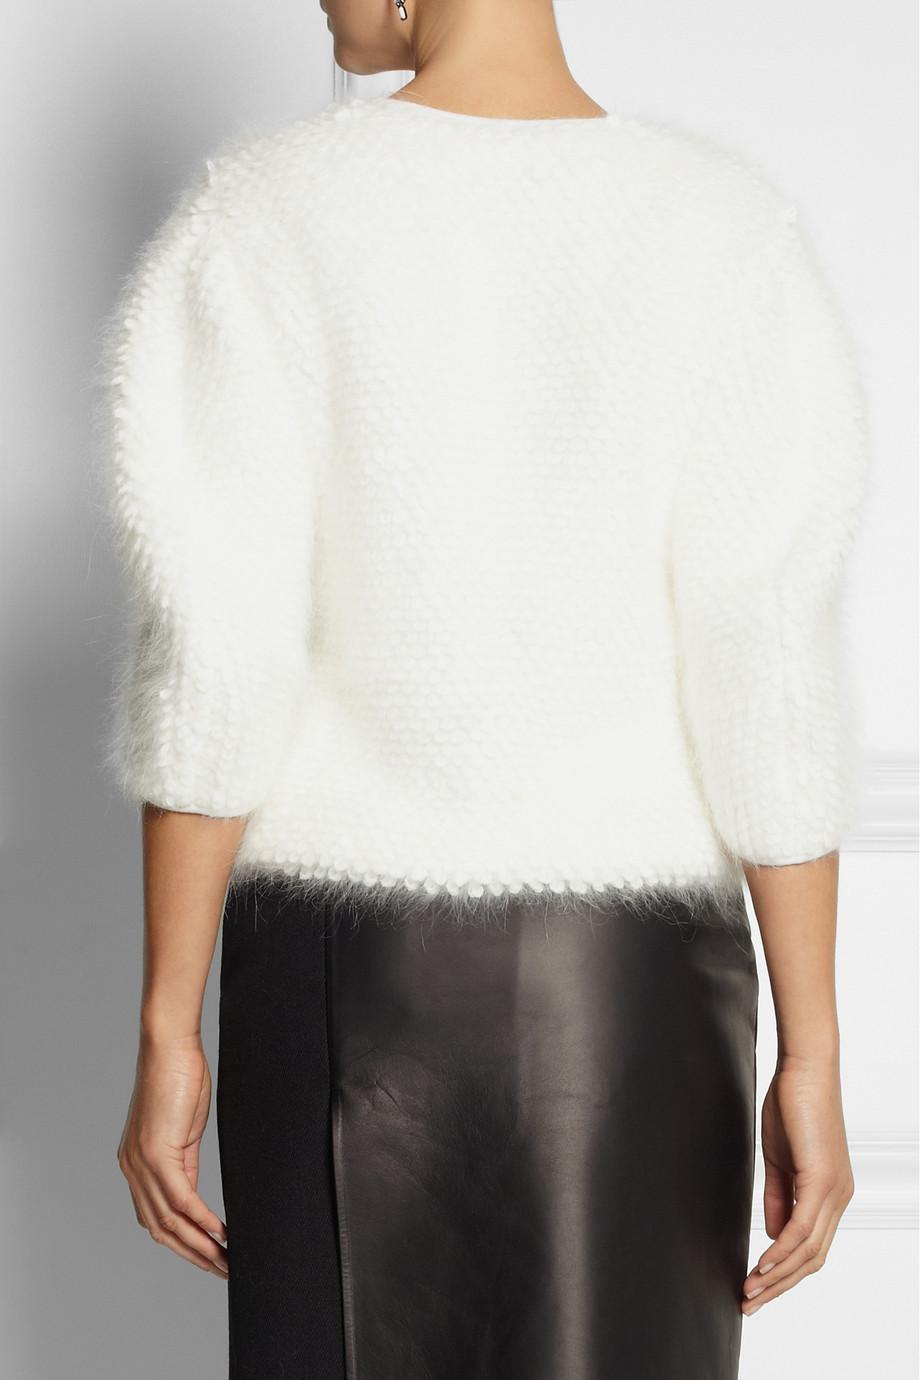 Fendi Angora And Wool Blend Sweater In White Lyst